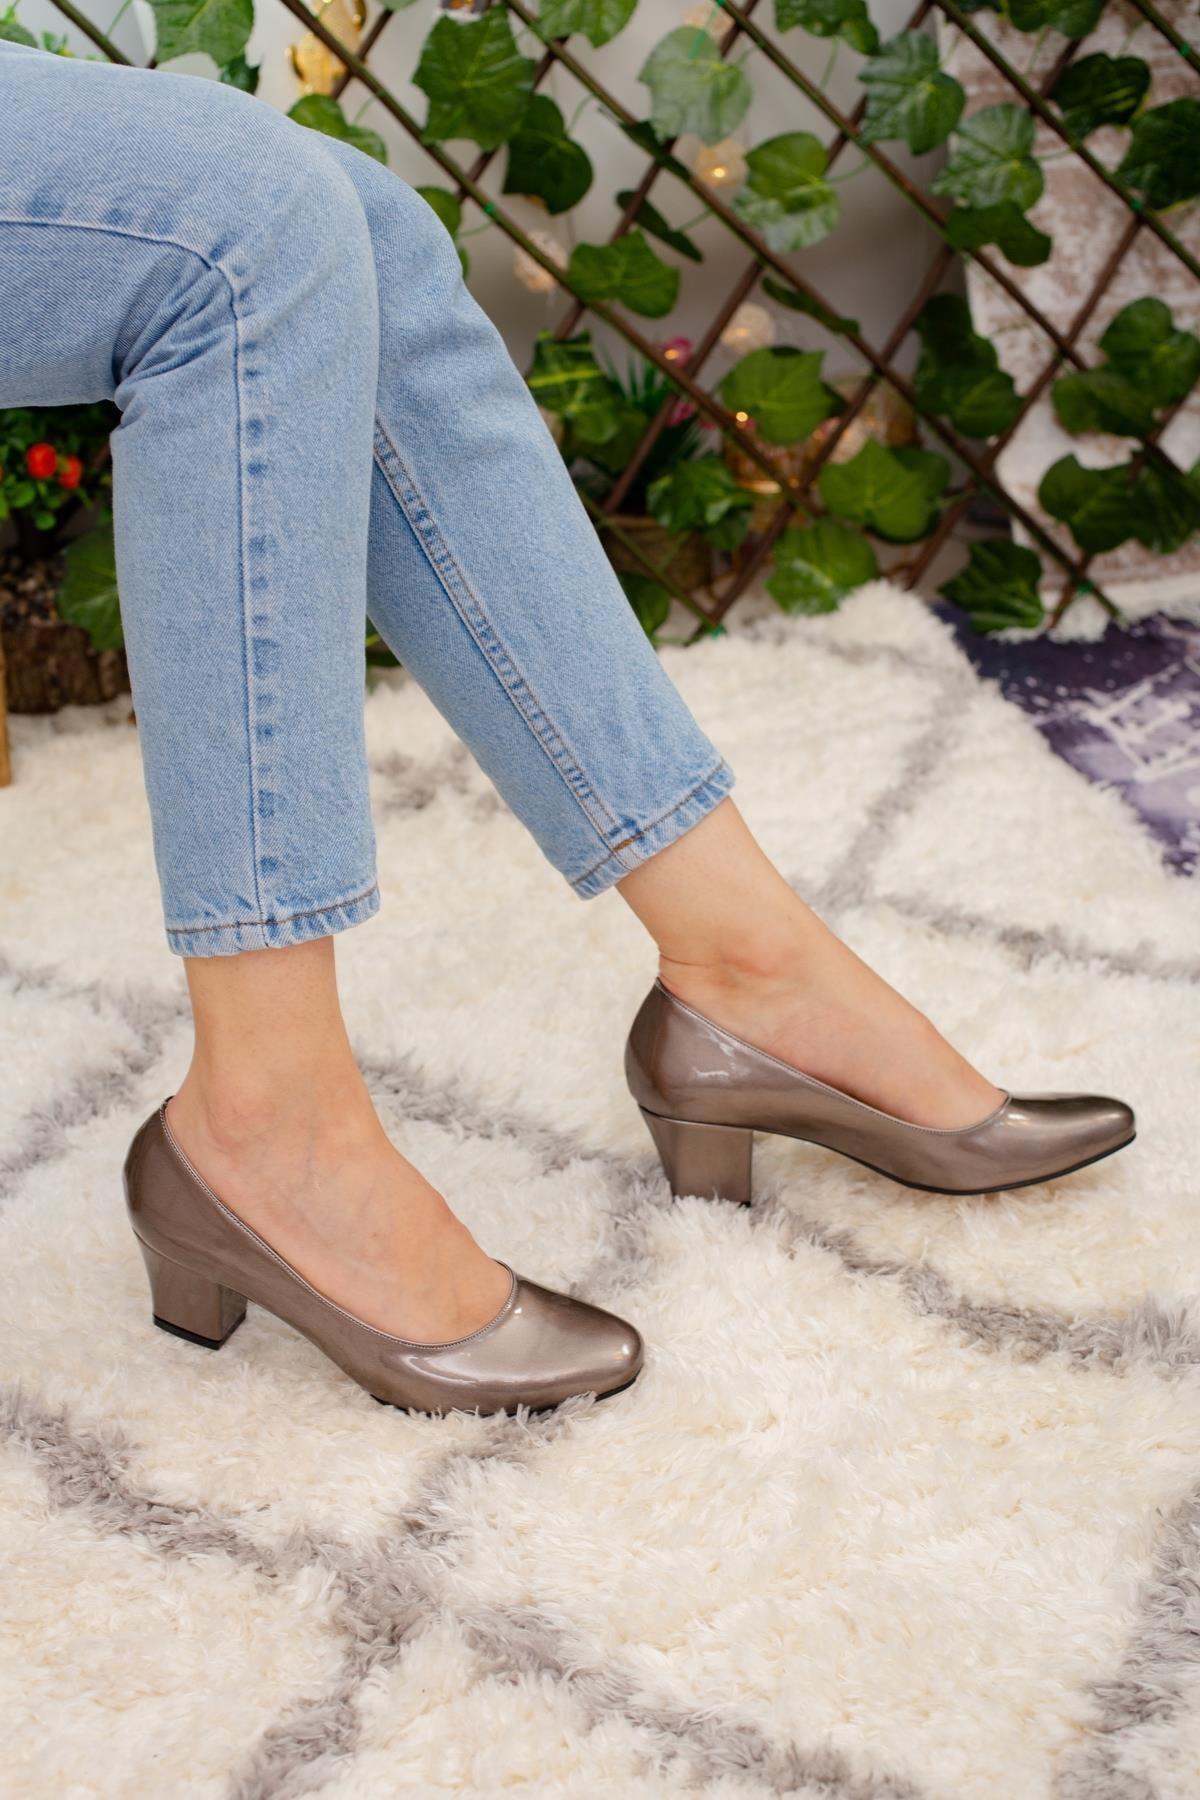 Limoya Charlee Platin Parlak Kısa Topuklu Ayakkabı 1